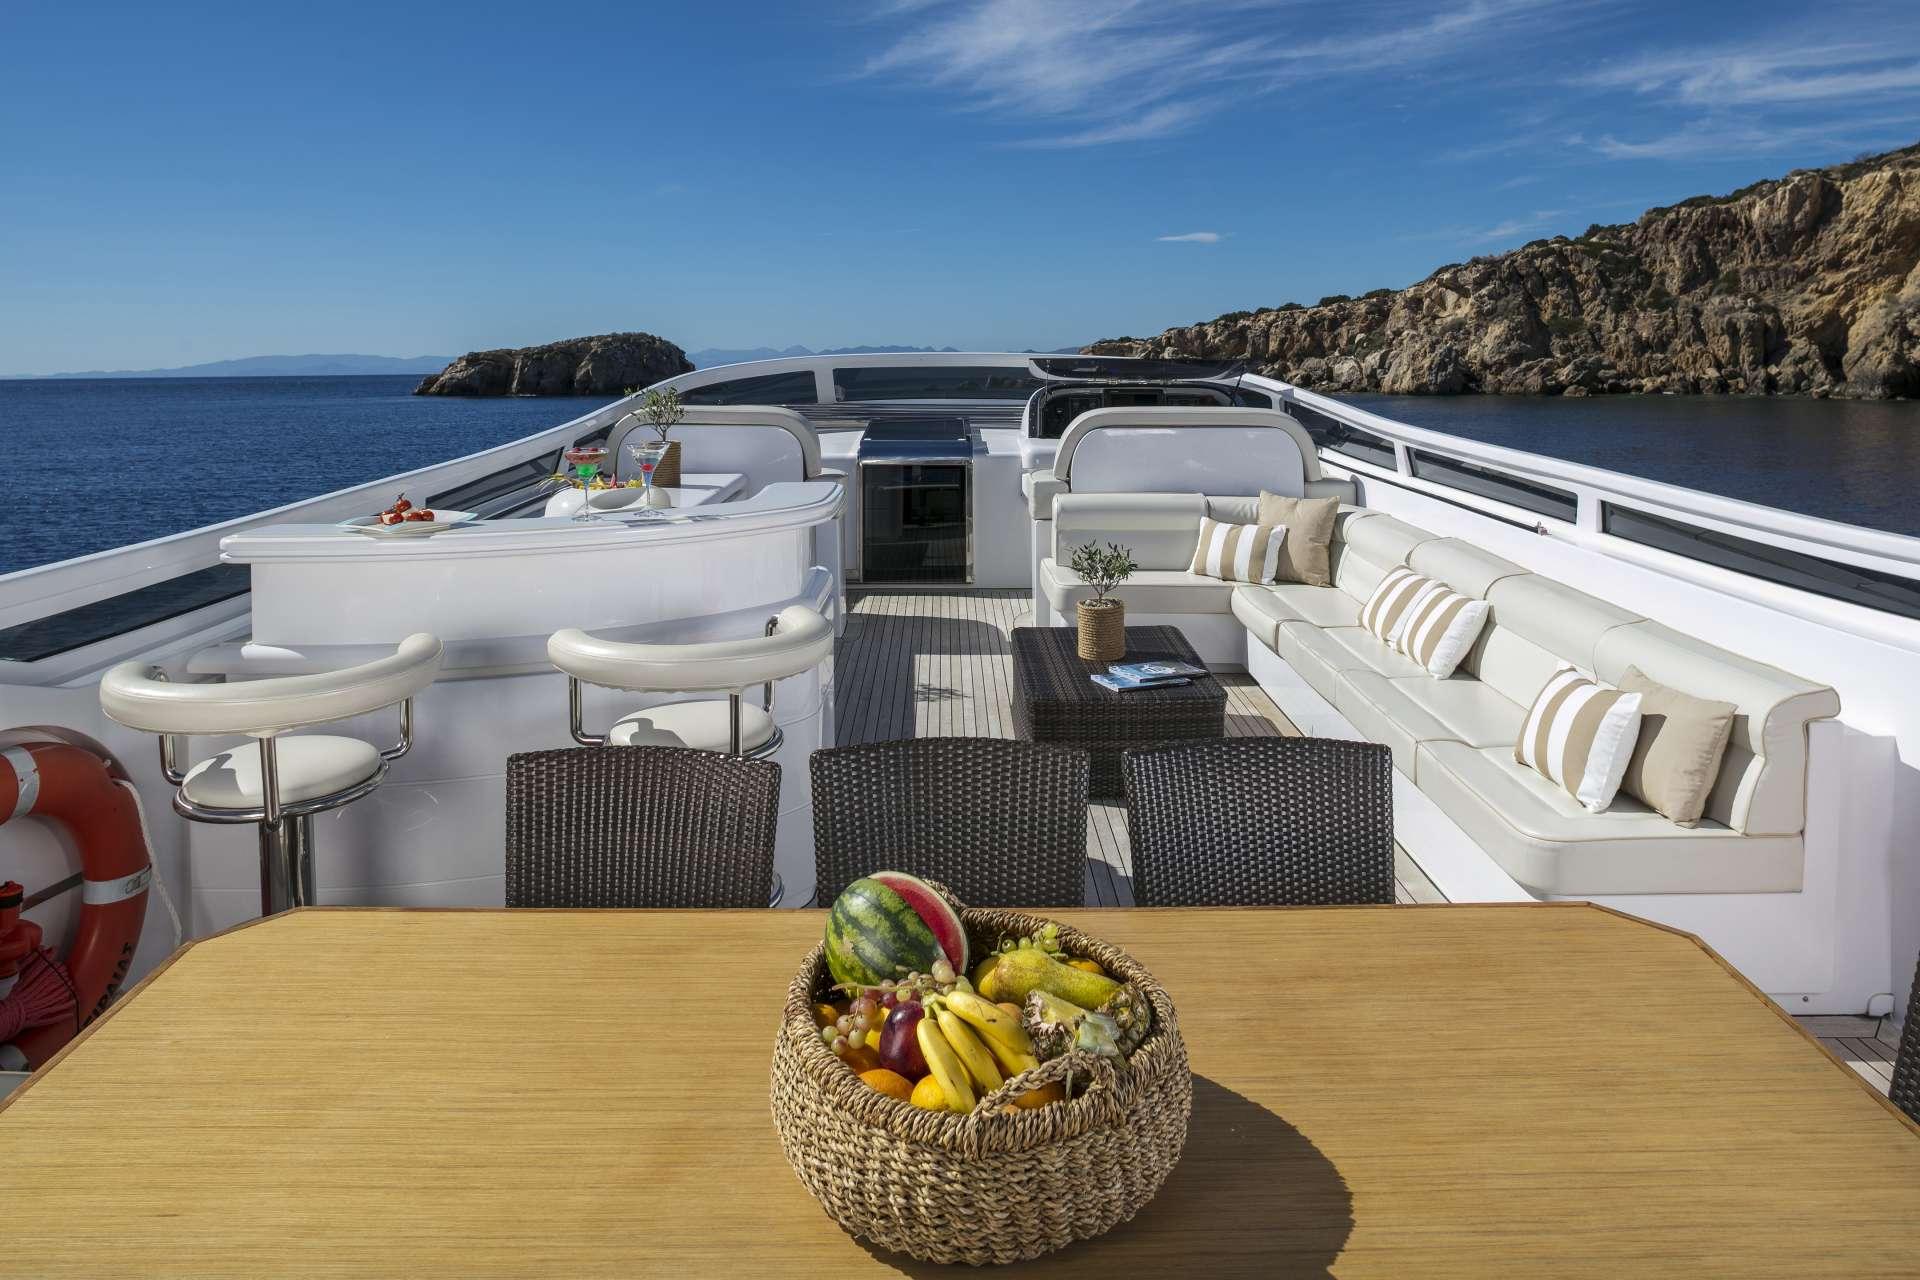 Motor Yacht 'PARIS A' Upper deck, 12 PAX, 6 Crew, 115.00 Ft, 35.06 Meters, Built 2009, Majora, Refit Year 2013